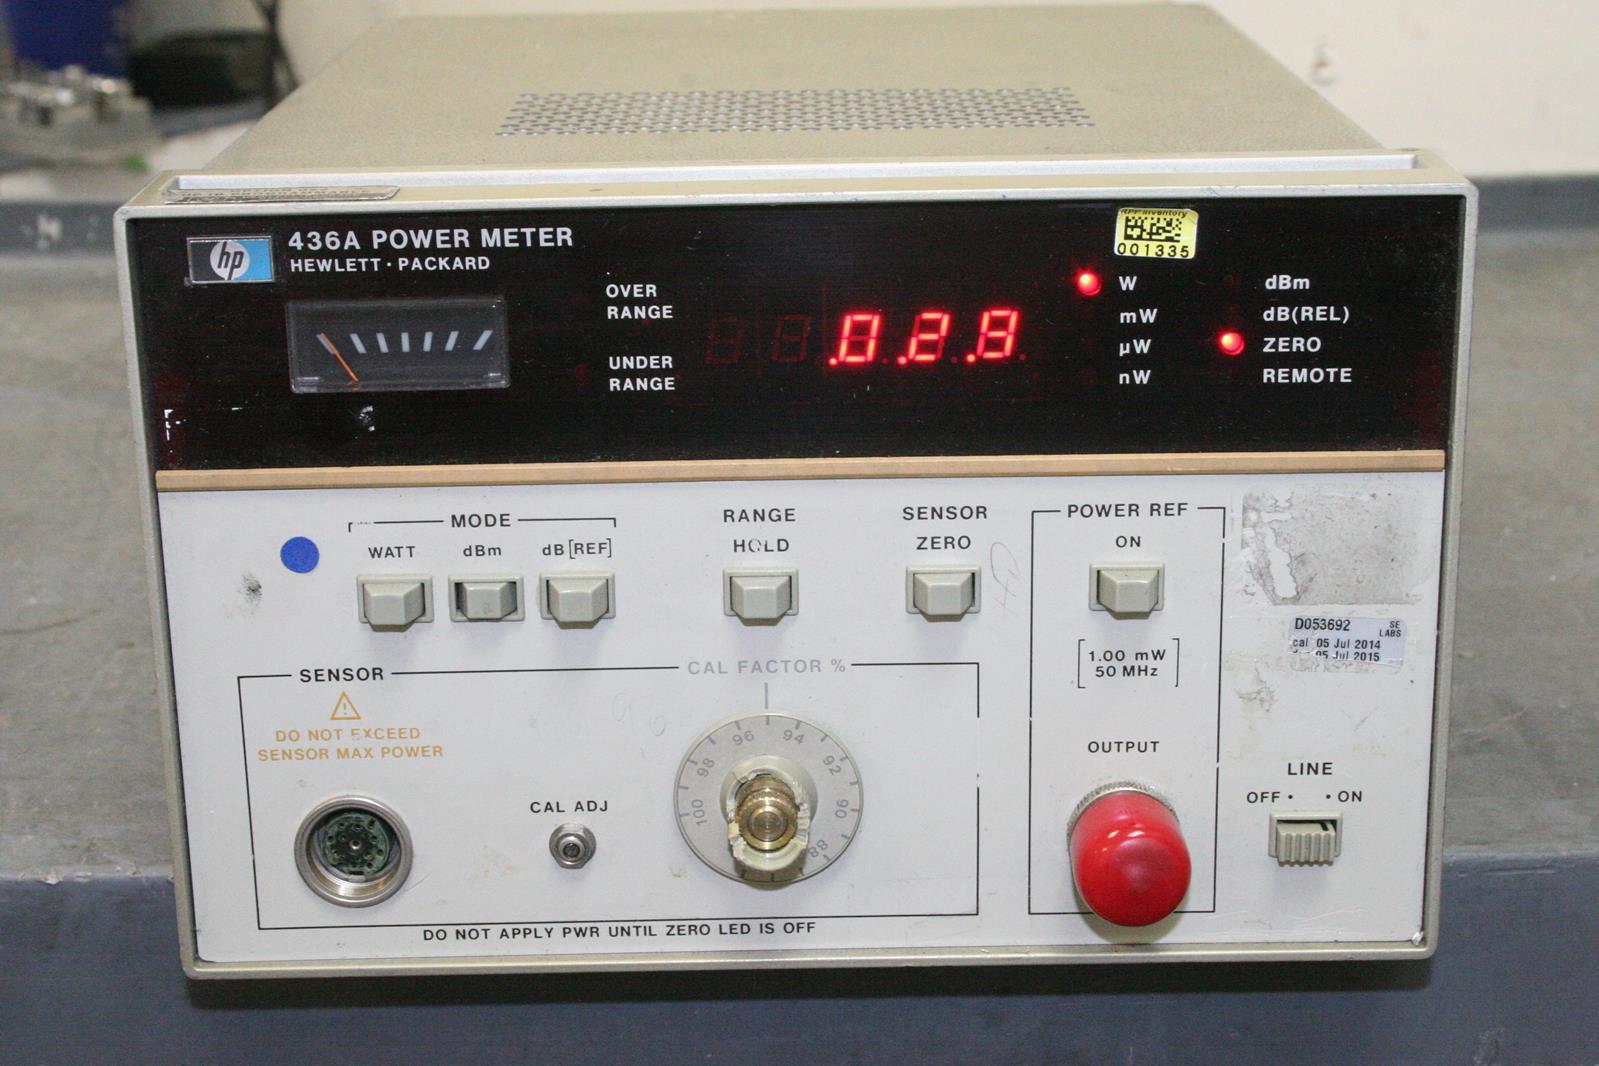 hp 436a power meter option 022 broken calibration knob ebay rh ebay com Agilent Power Meter Power Meter 435 HP